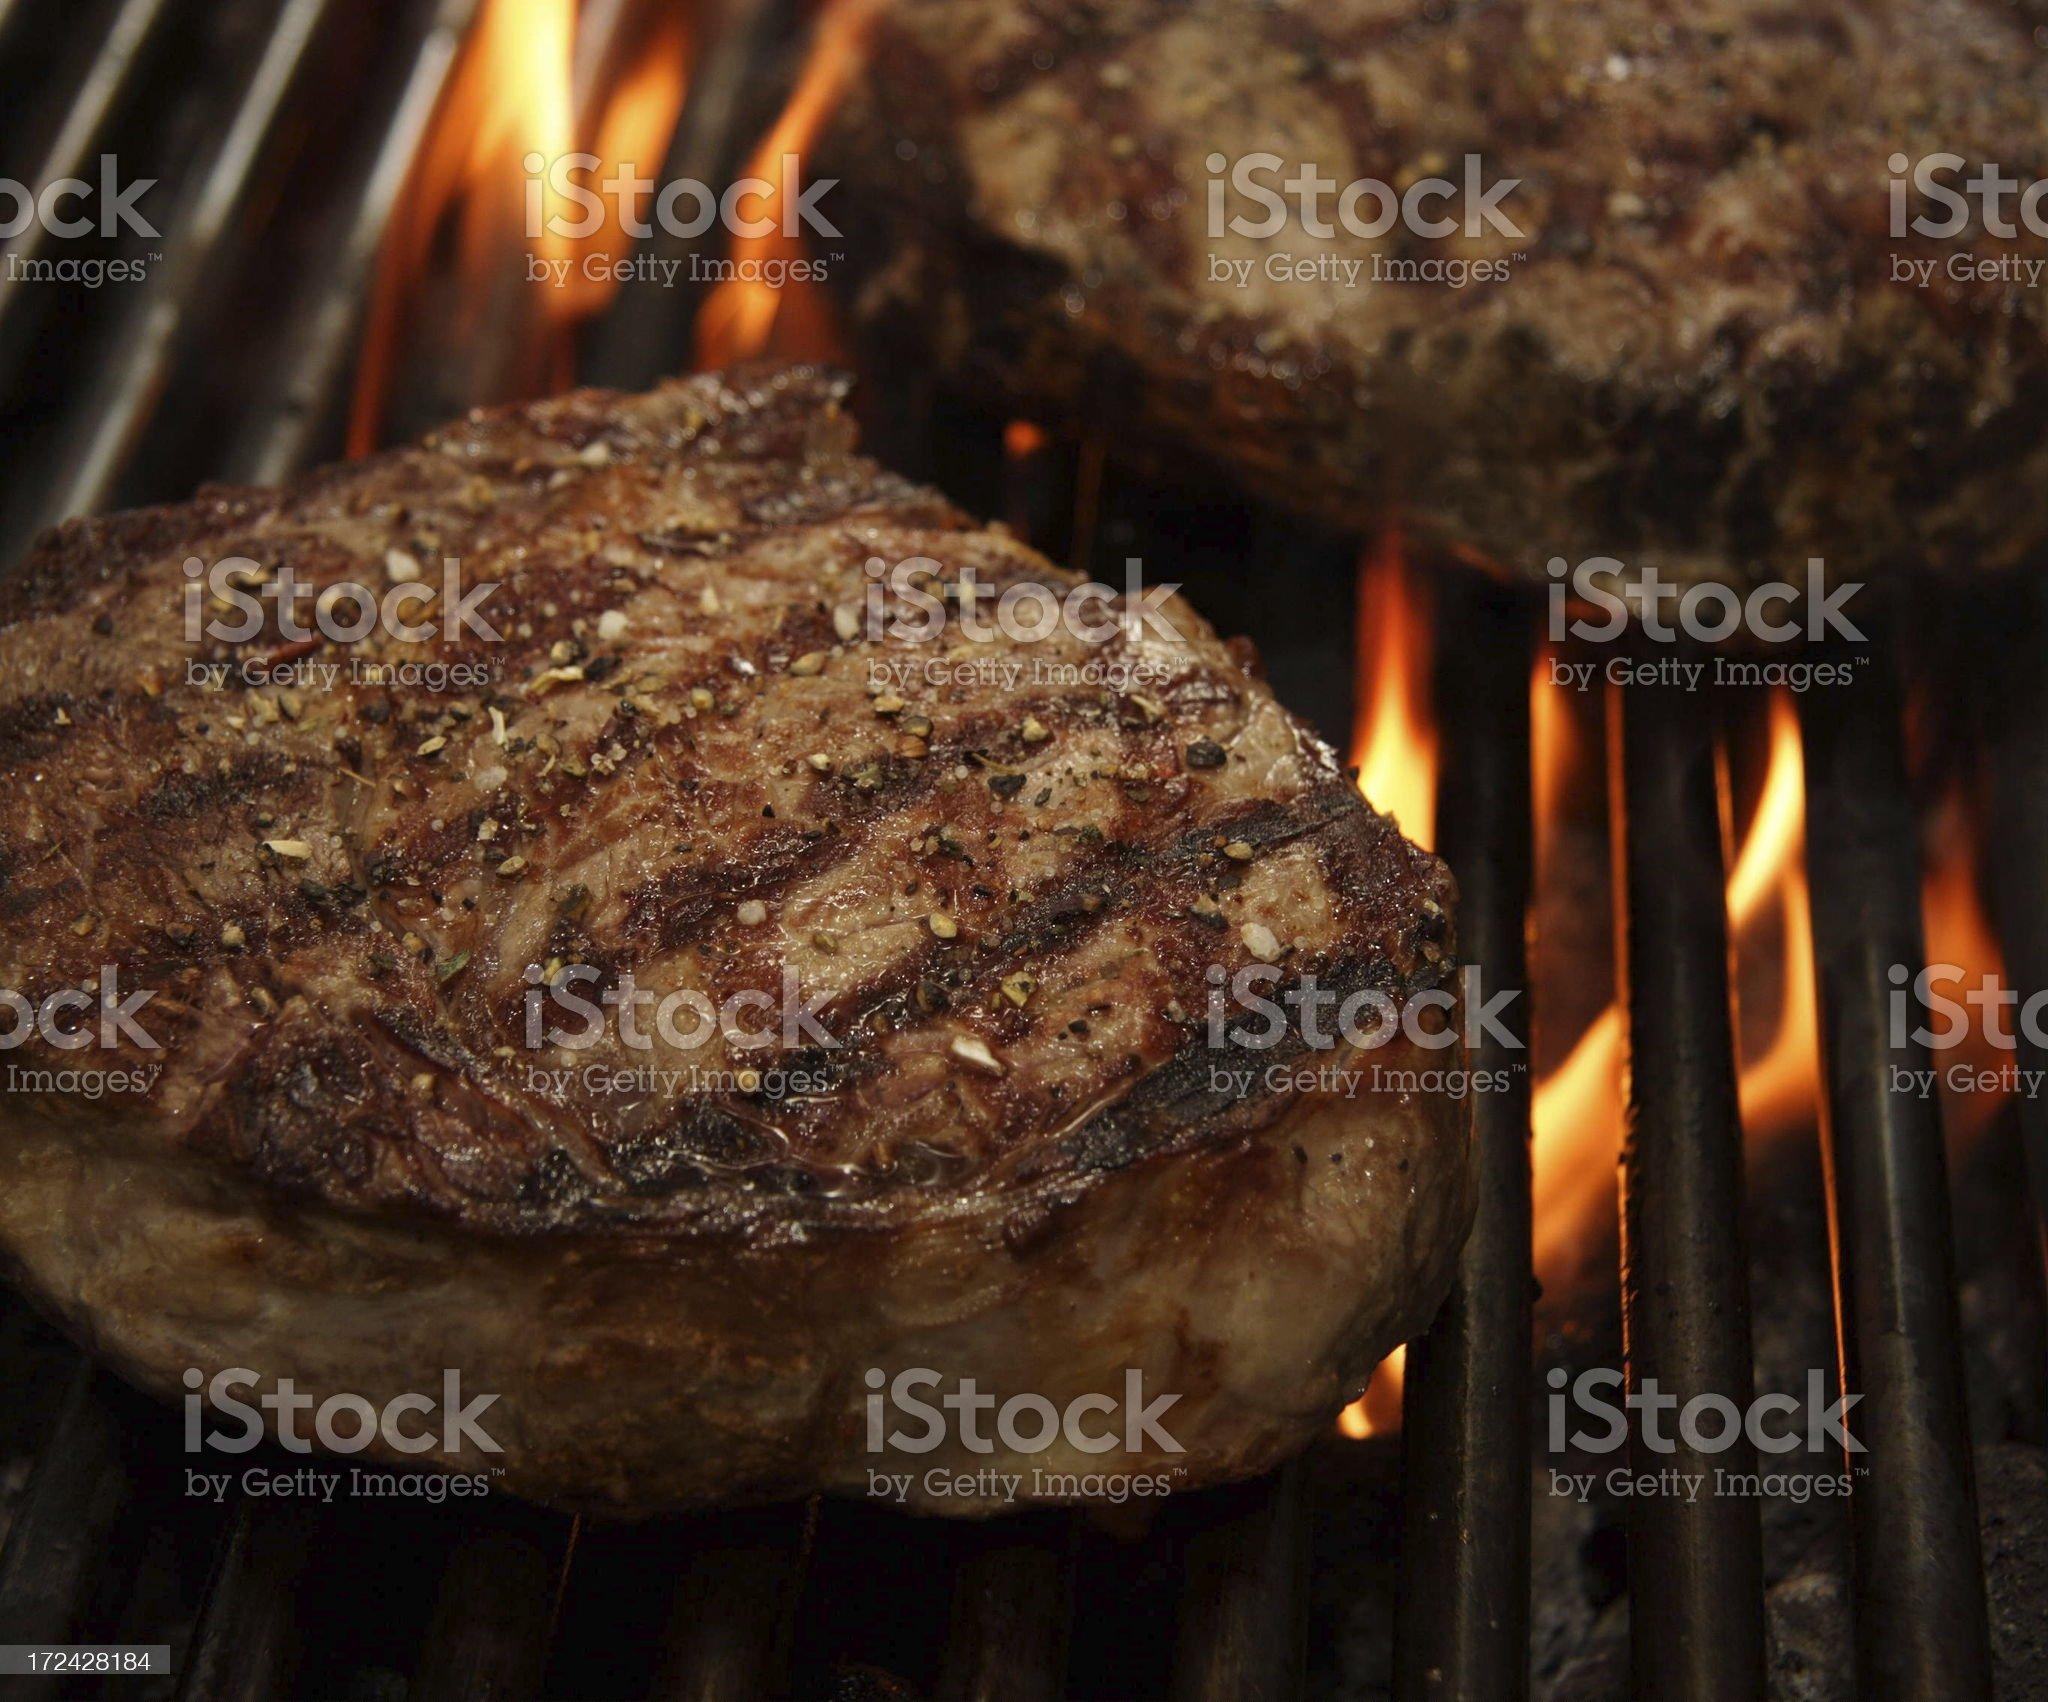 Entrecote Ribeye steak and fire royalty-free stock photo